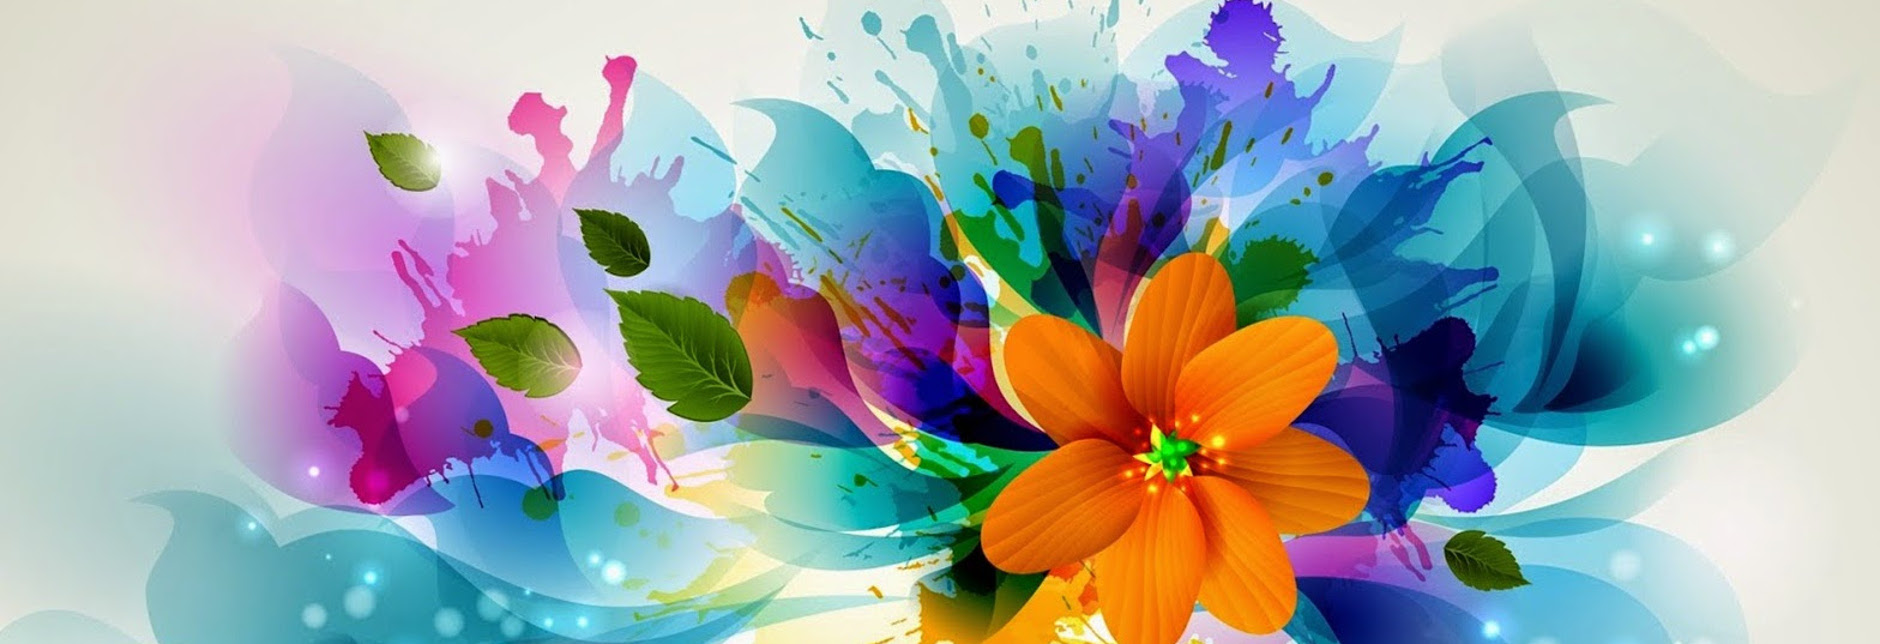 flowers-background-header.jpg